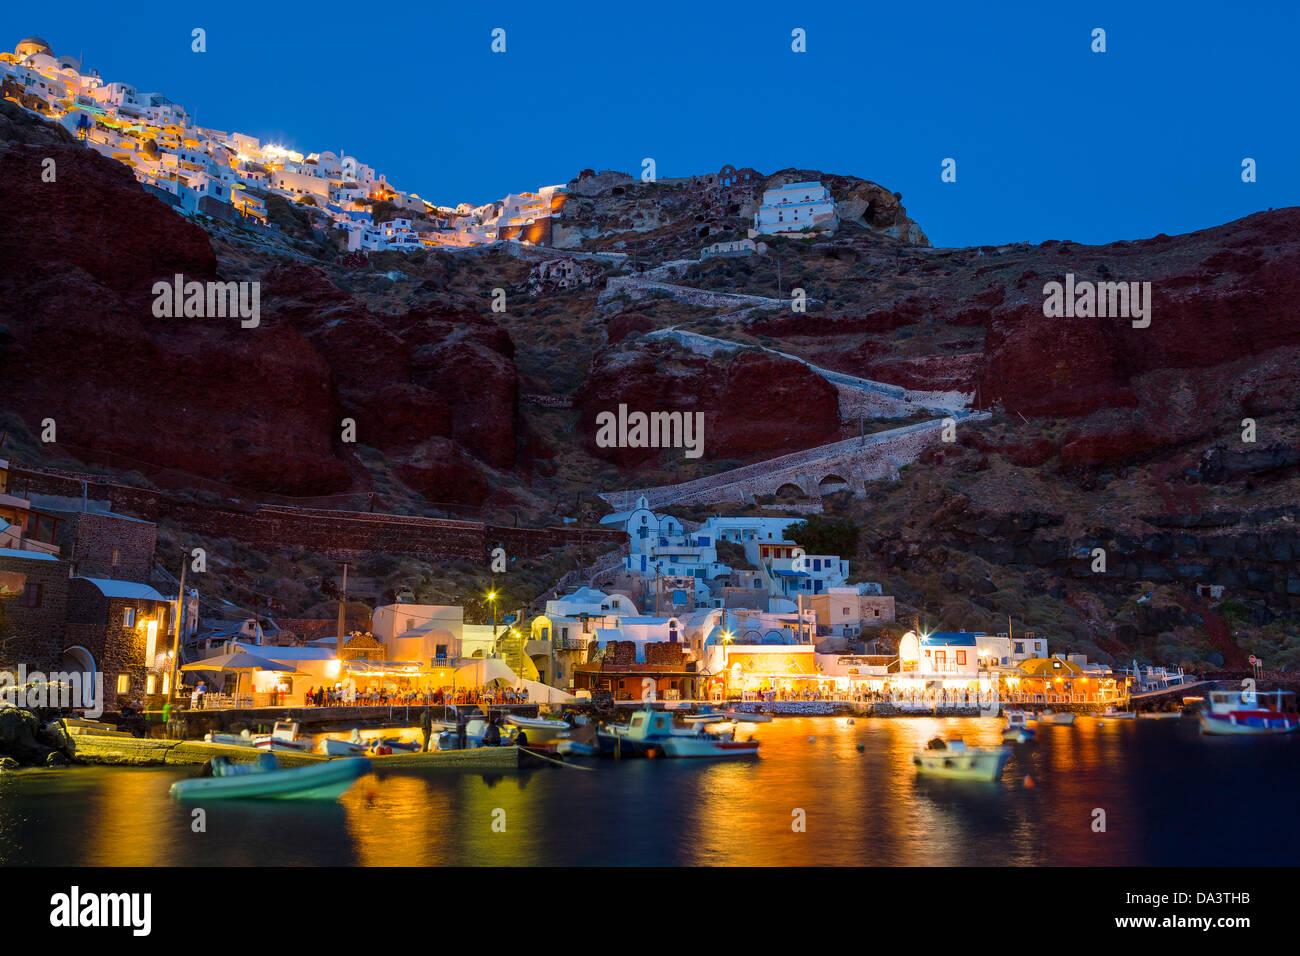 Photo de nuit de la Baie d'Ammoudi à Oia Santorini Grèce ci-dessus. Photo Stock